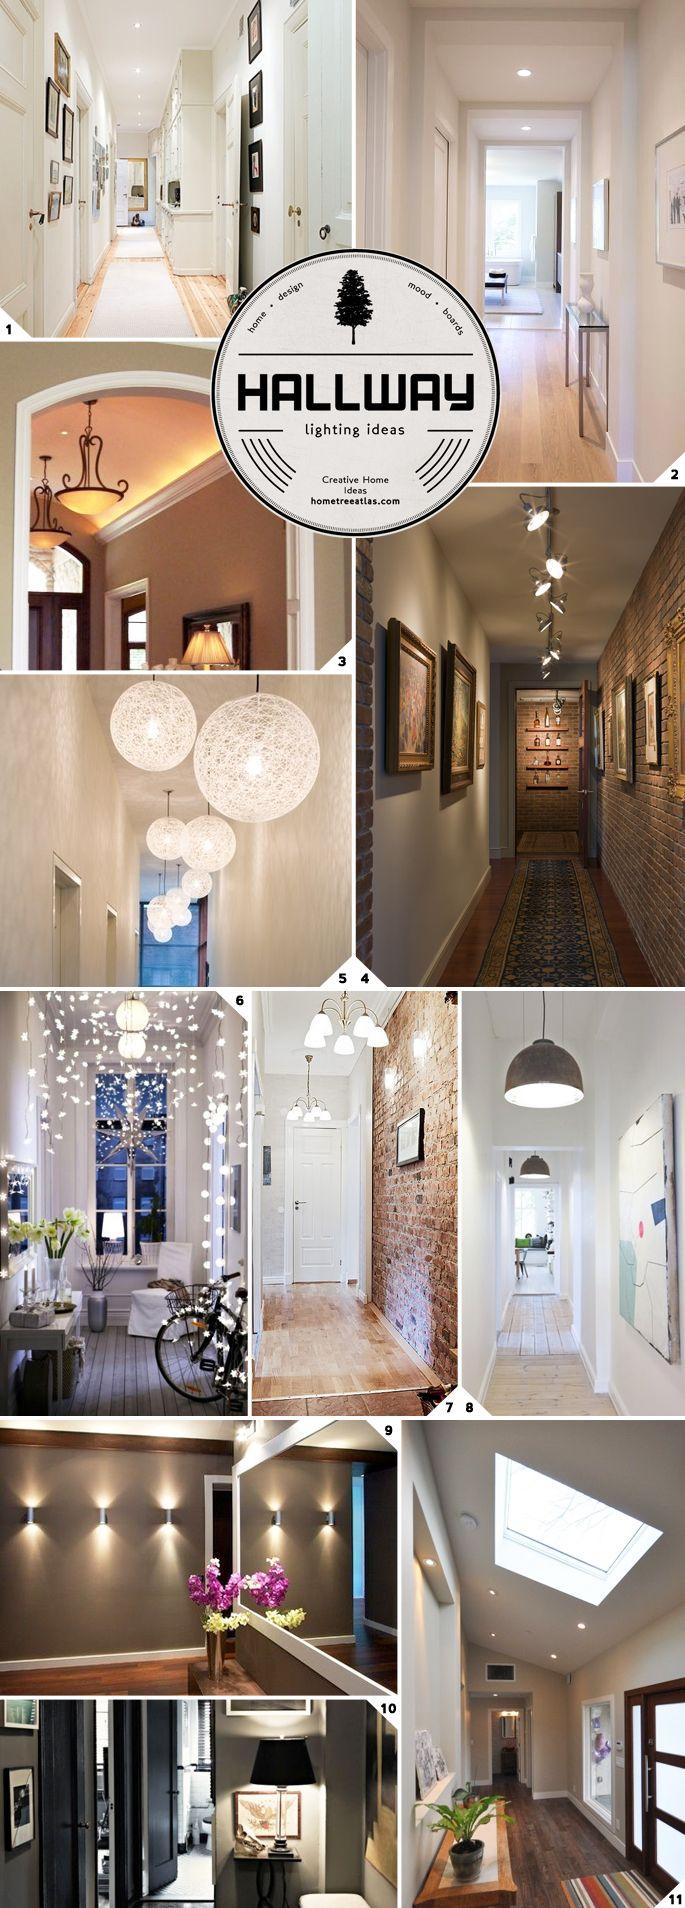 25 Best Ideas about Hallway Lighting on Pinterest  Hallway light